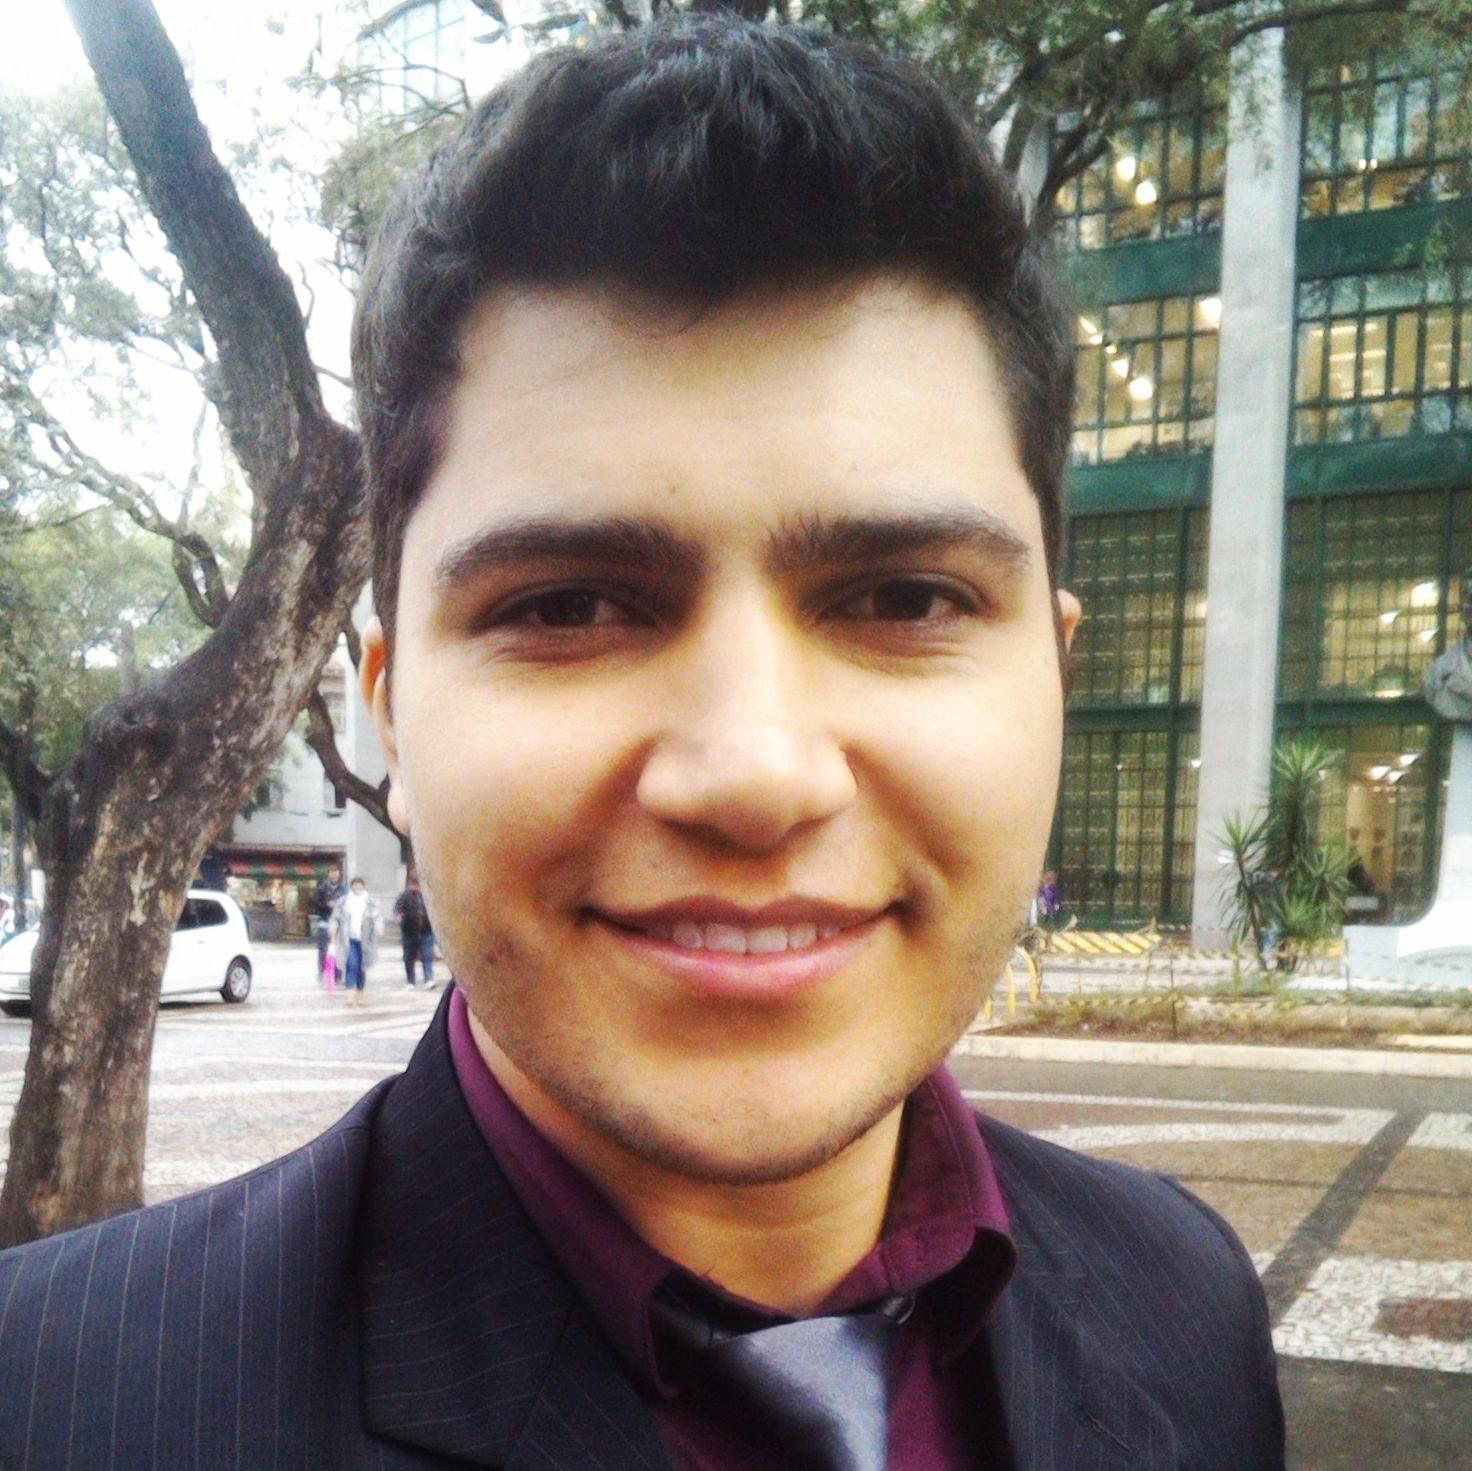 Rodrigo Augusto Calixto